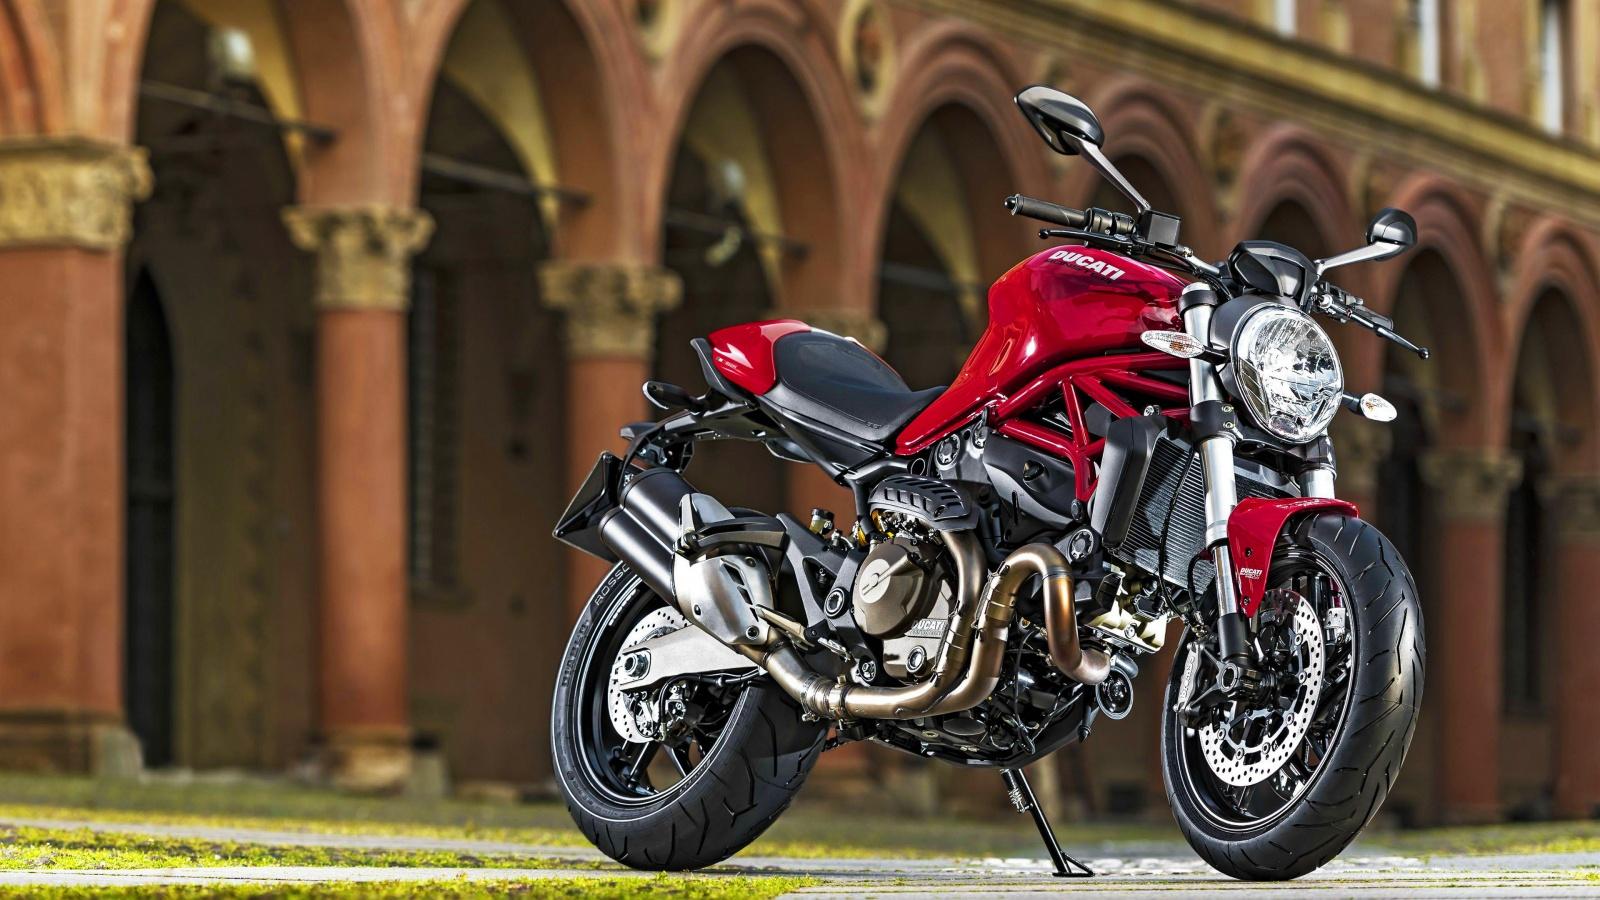 2015 Ducati Monster 821 Wallpapers In Jpg Format For Free Download